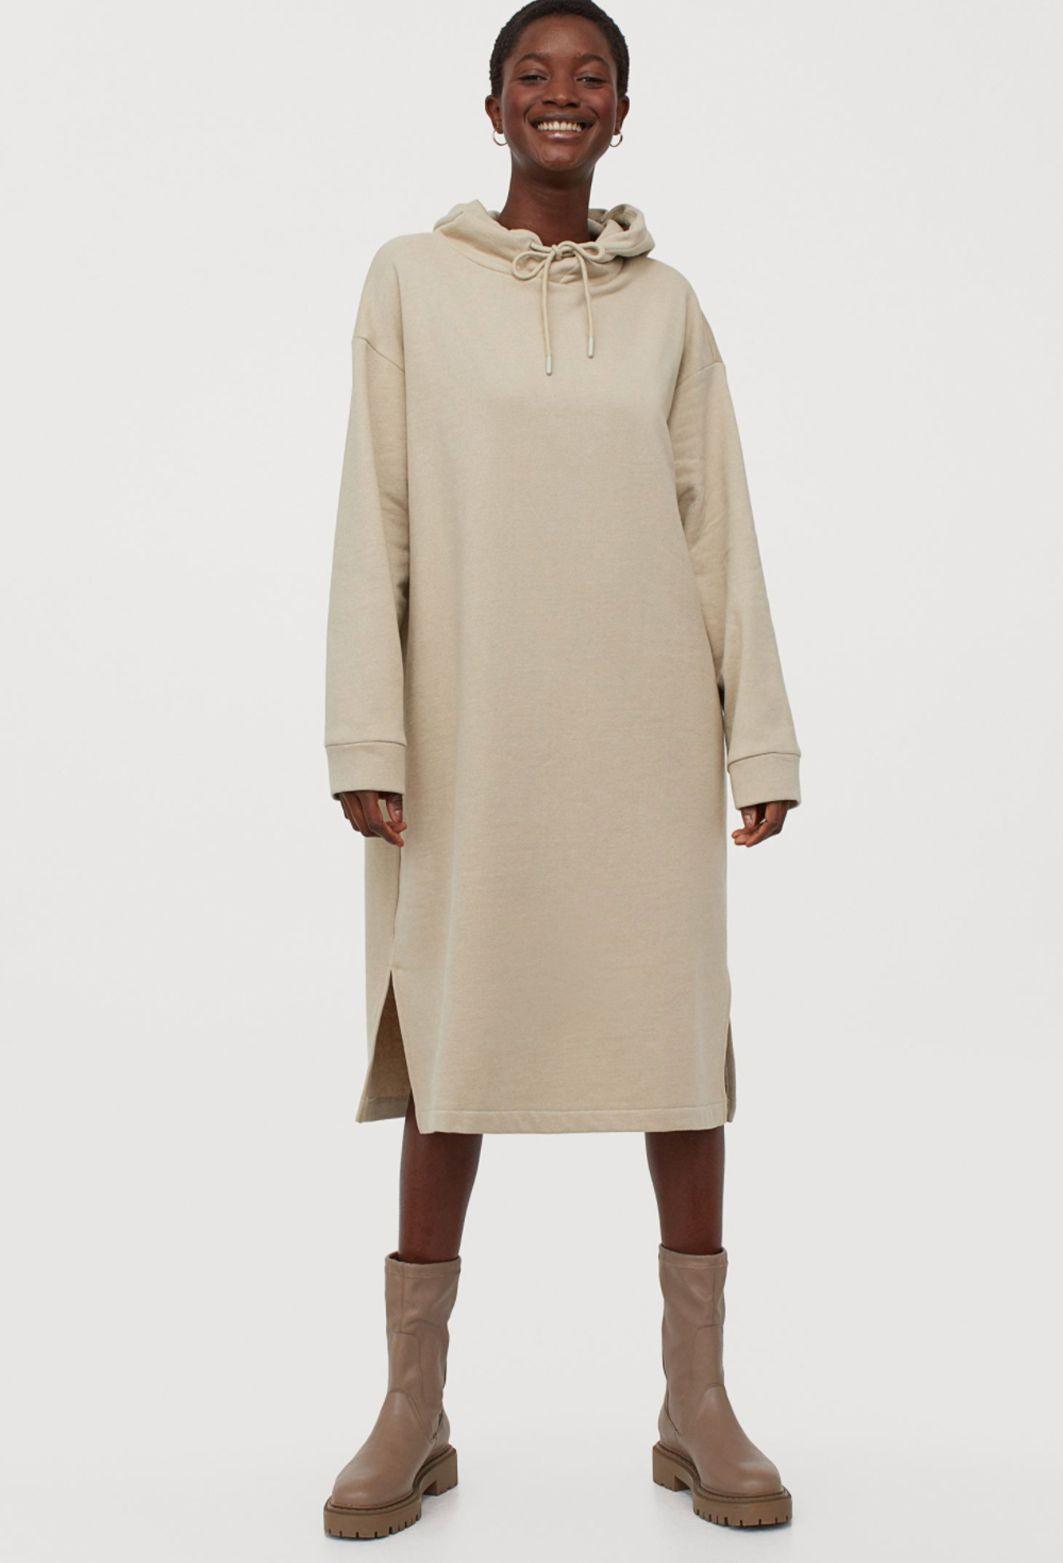 Langärmlige Kleider Winterfeste Trenddresses Bis 80 Euro